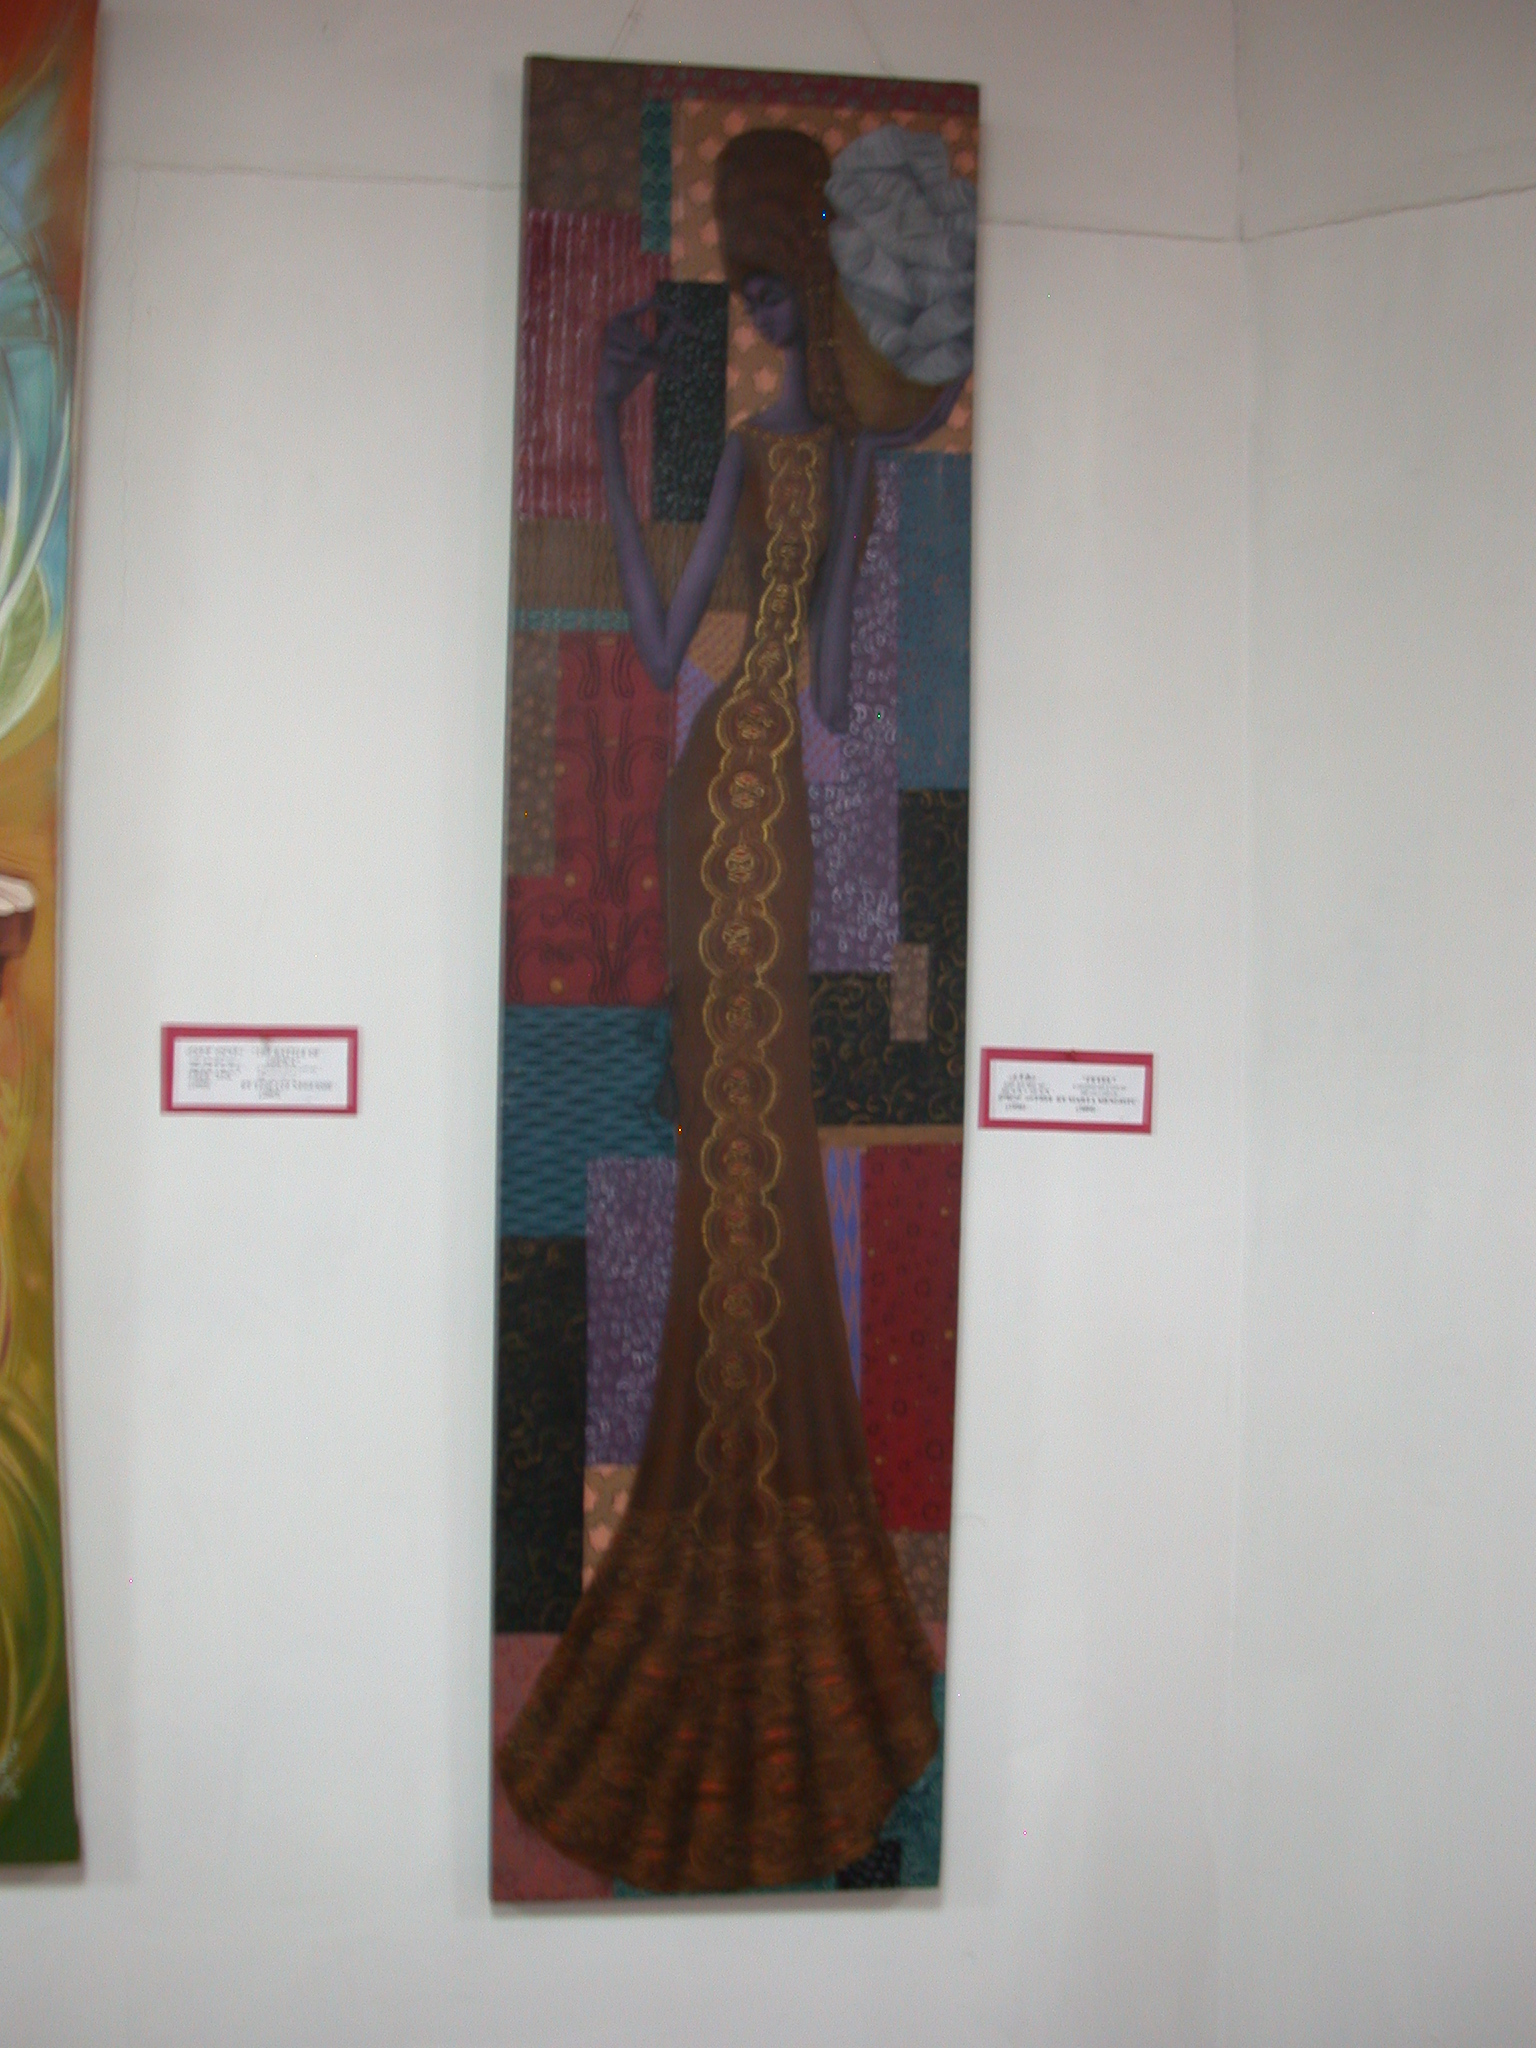 Fetel by Marta Mengistu (2004), National Museum, Addis Ababa, Ethiopia